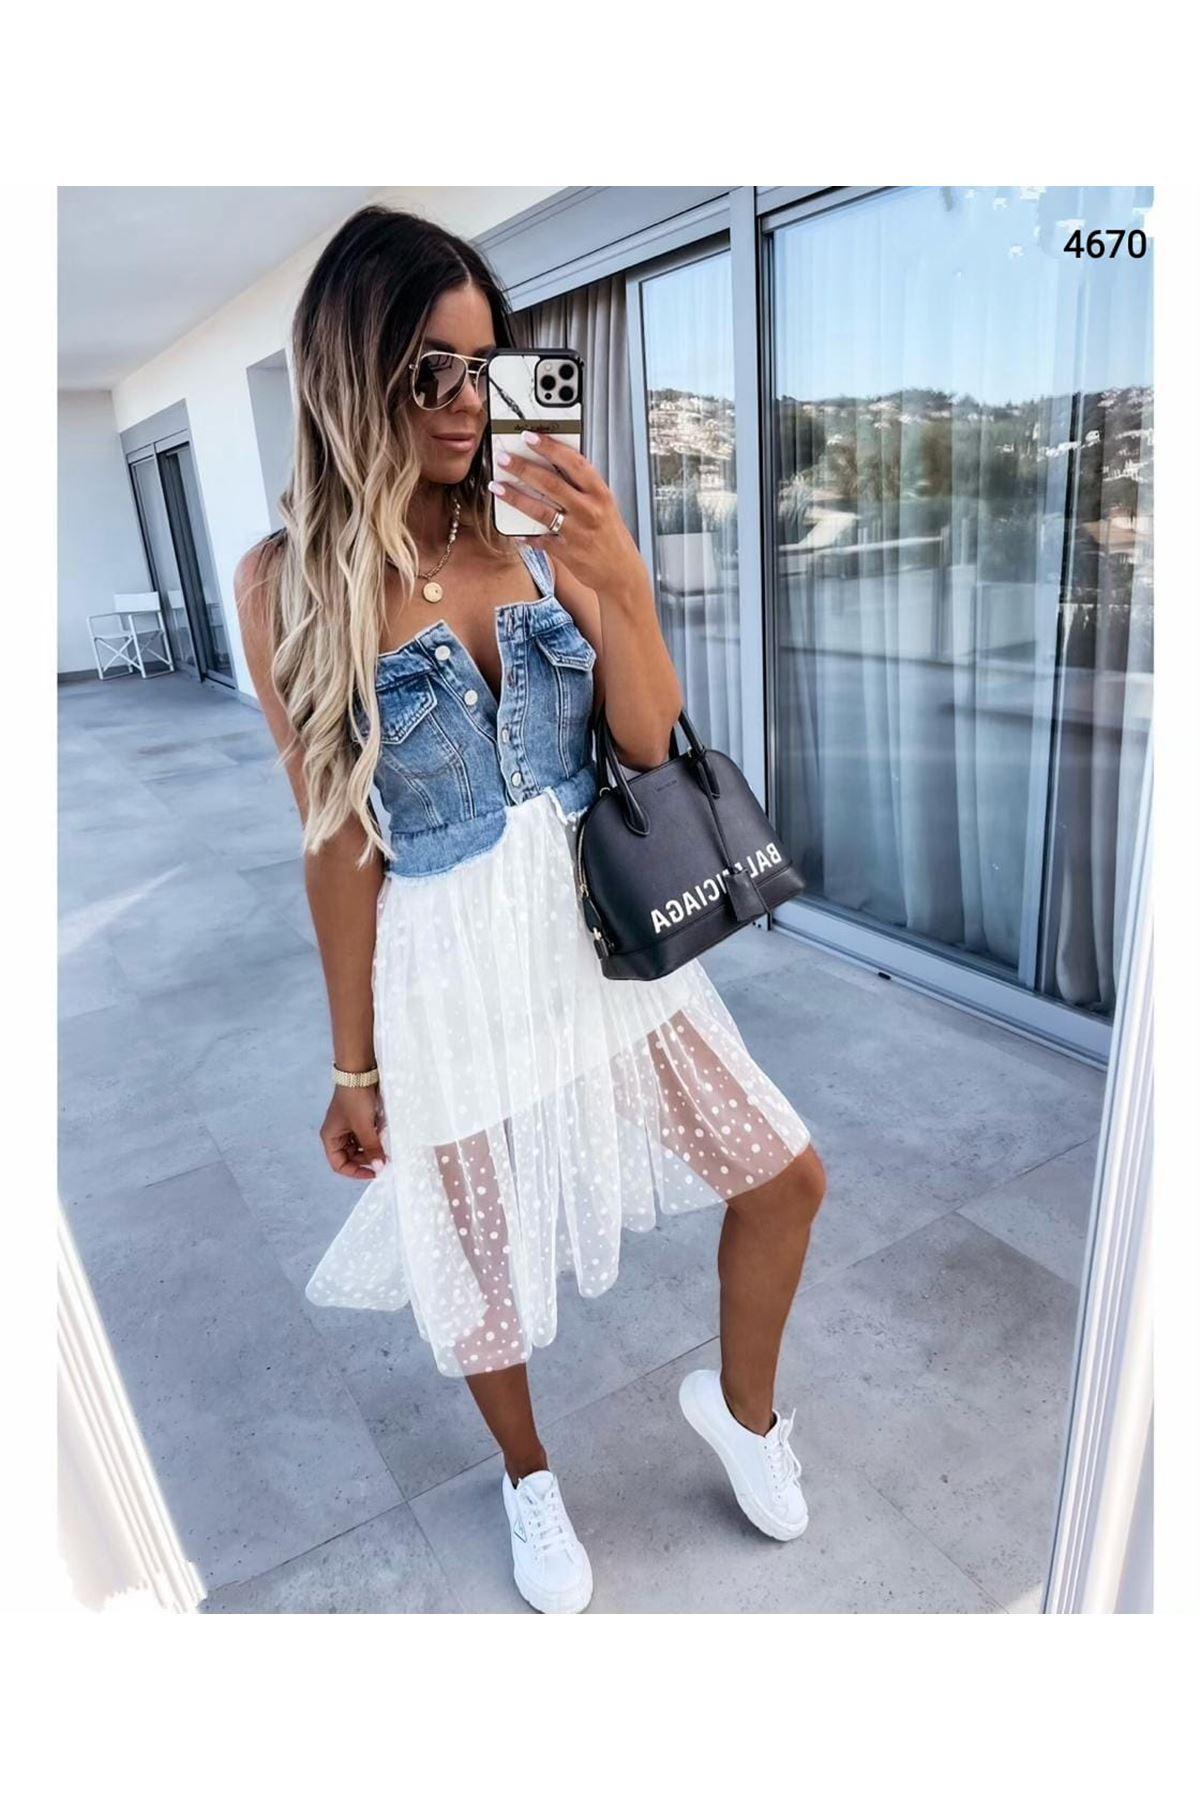 Floglu Tül Detaylı Kot Elbise - MAVİ